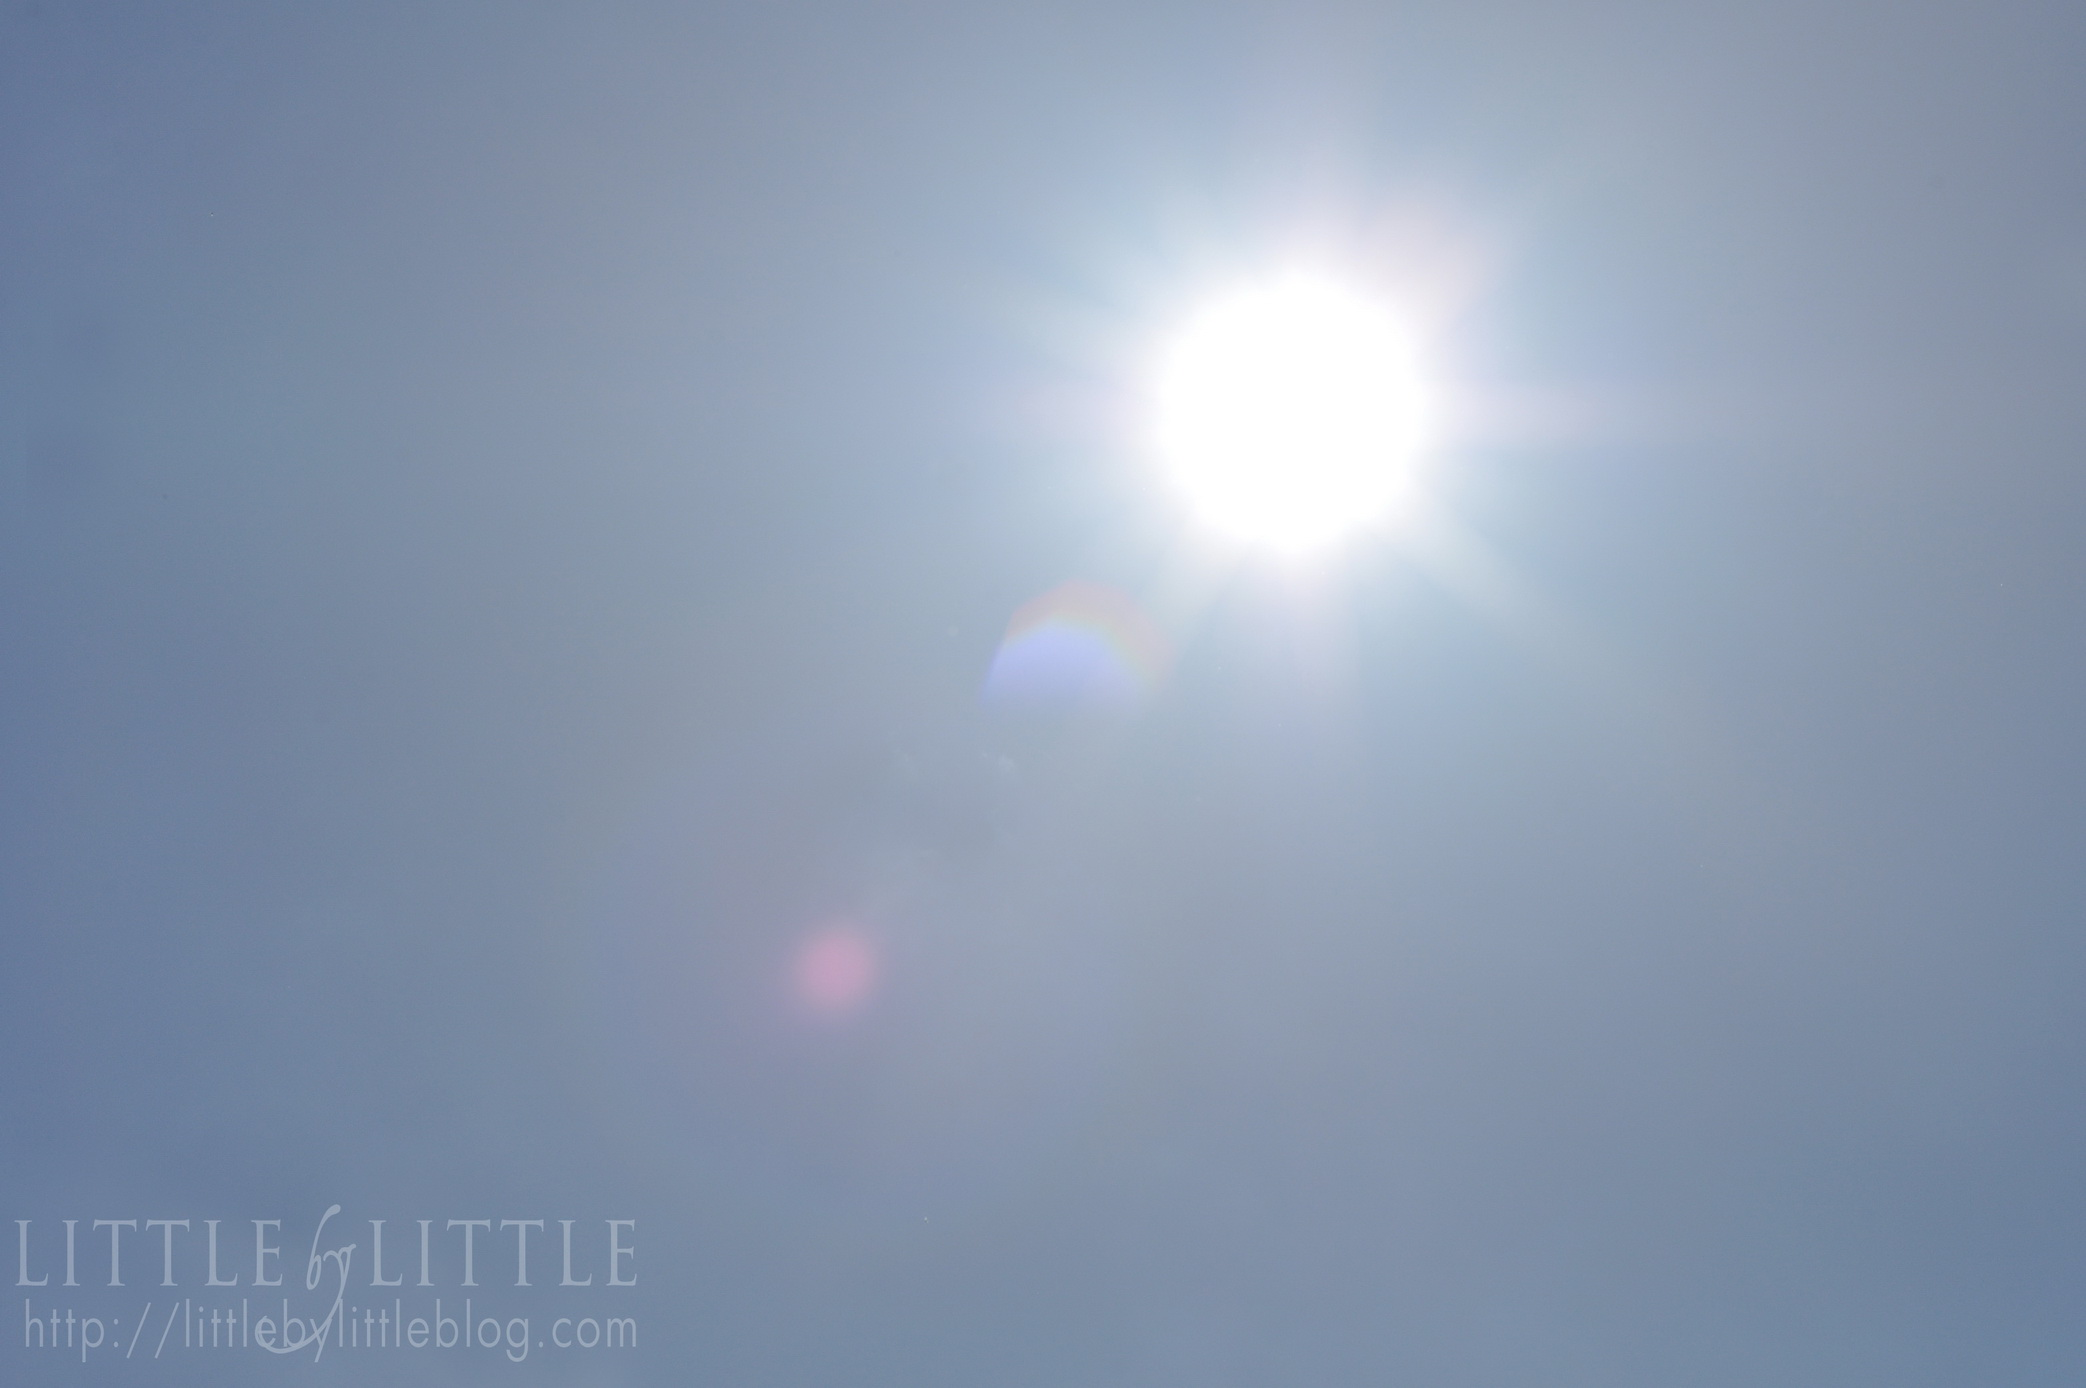 Sun Flare Logo 01 Resize Little By Little Blog